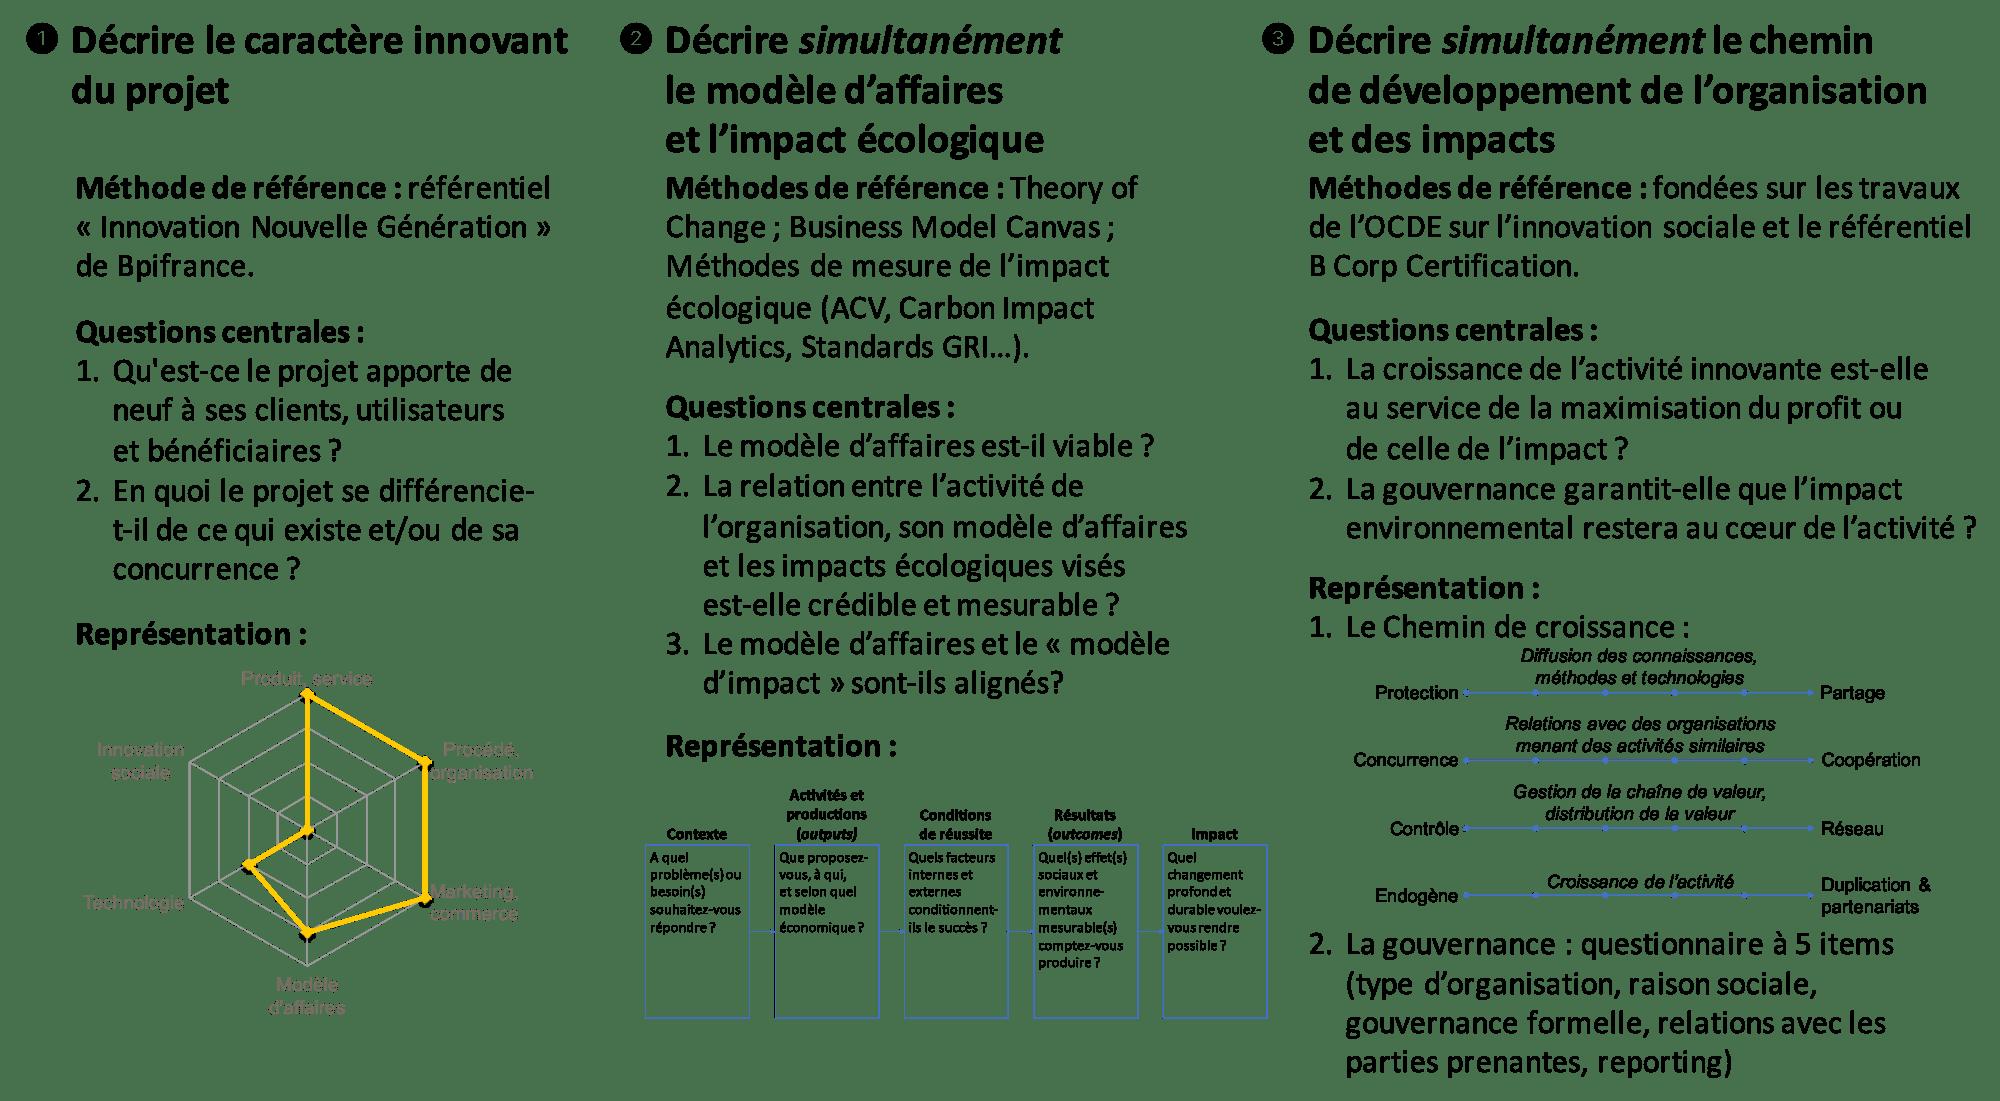 Innovation FActeur 4 : schéma de synthèse